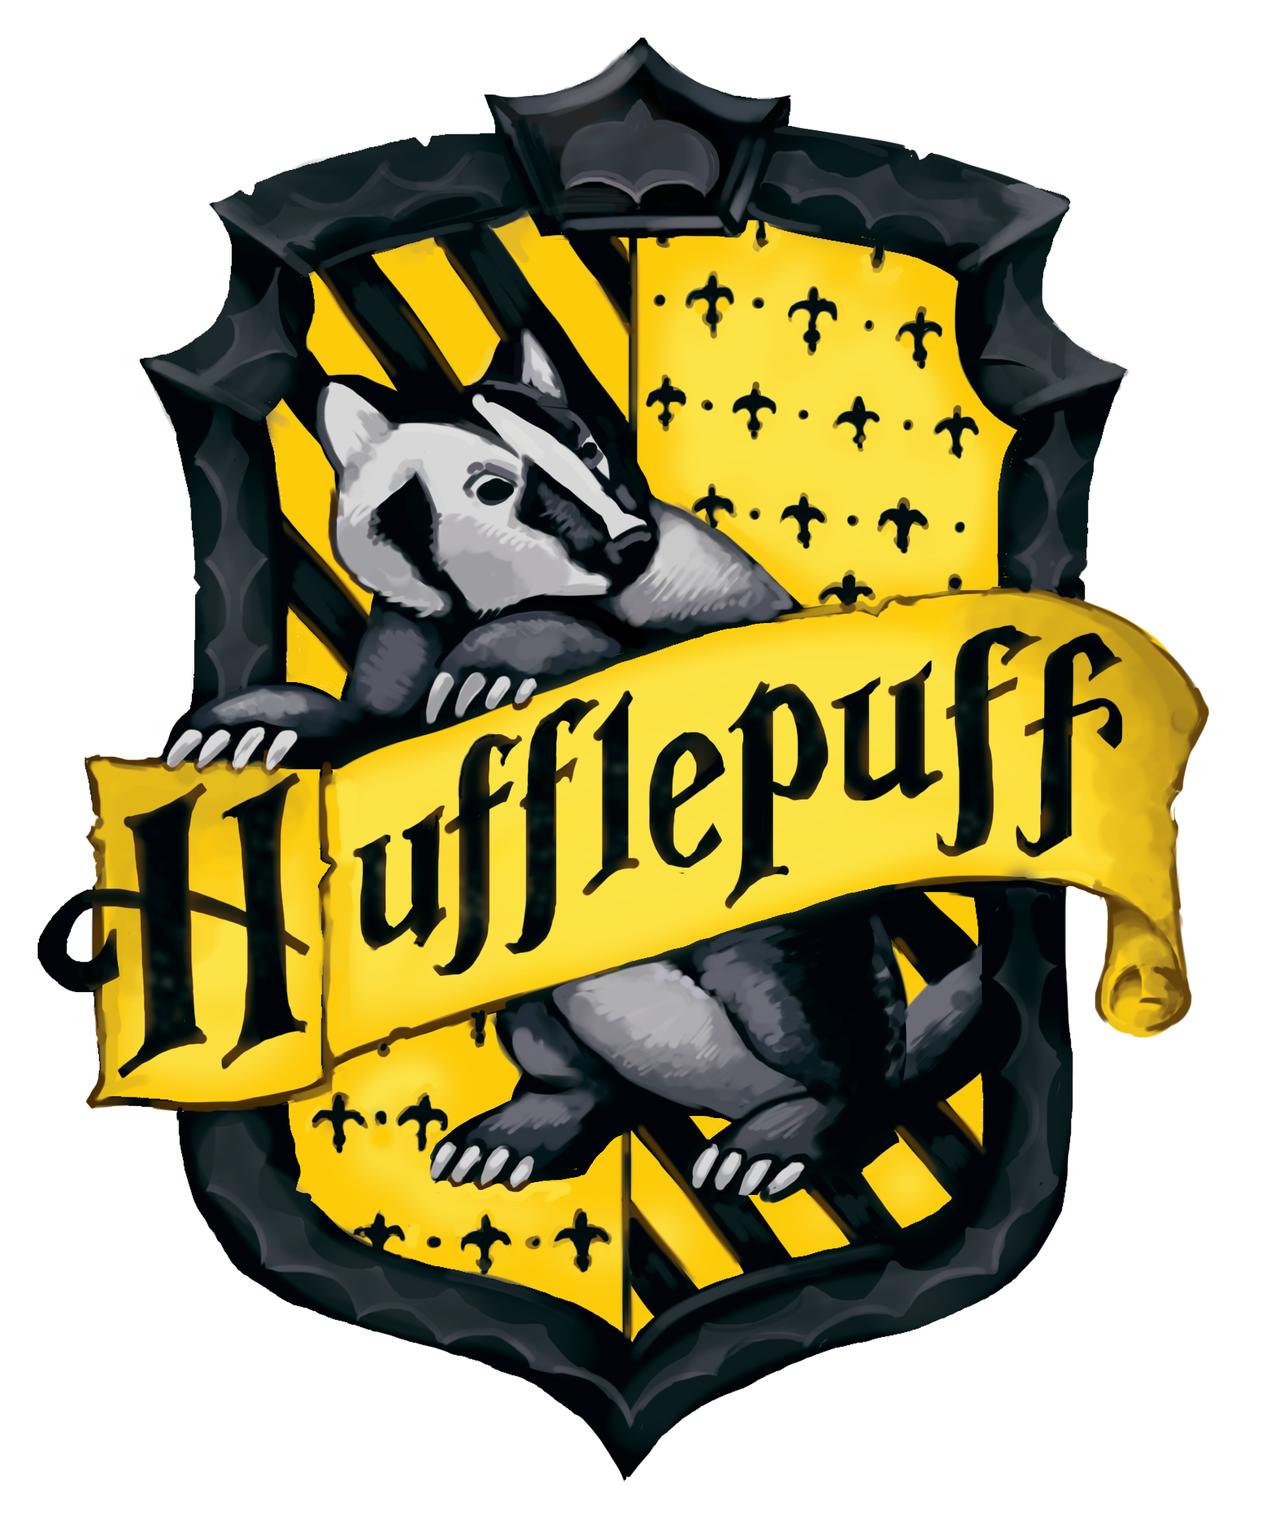 Hufflepuff Crest Tattoos and Piercings Pinterest